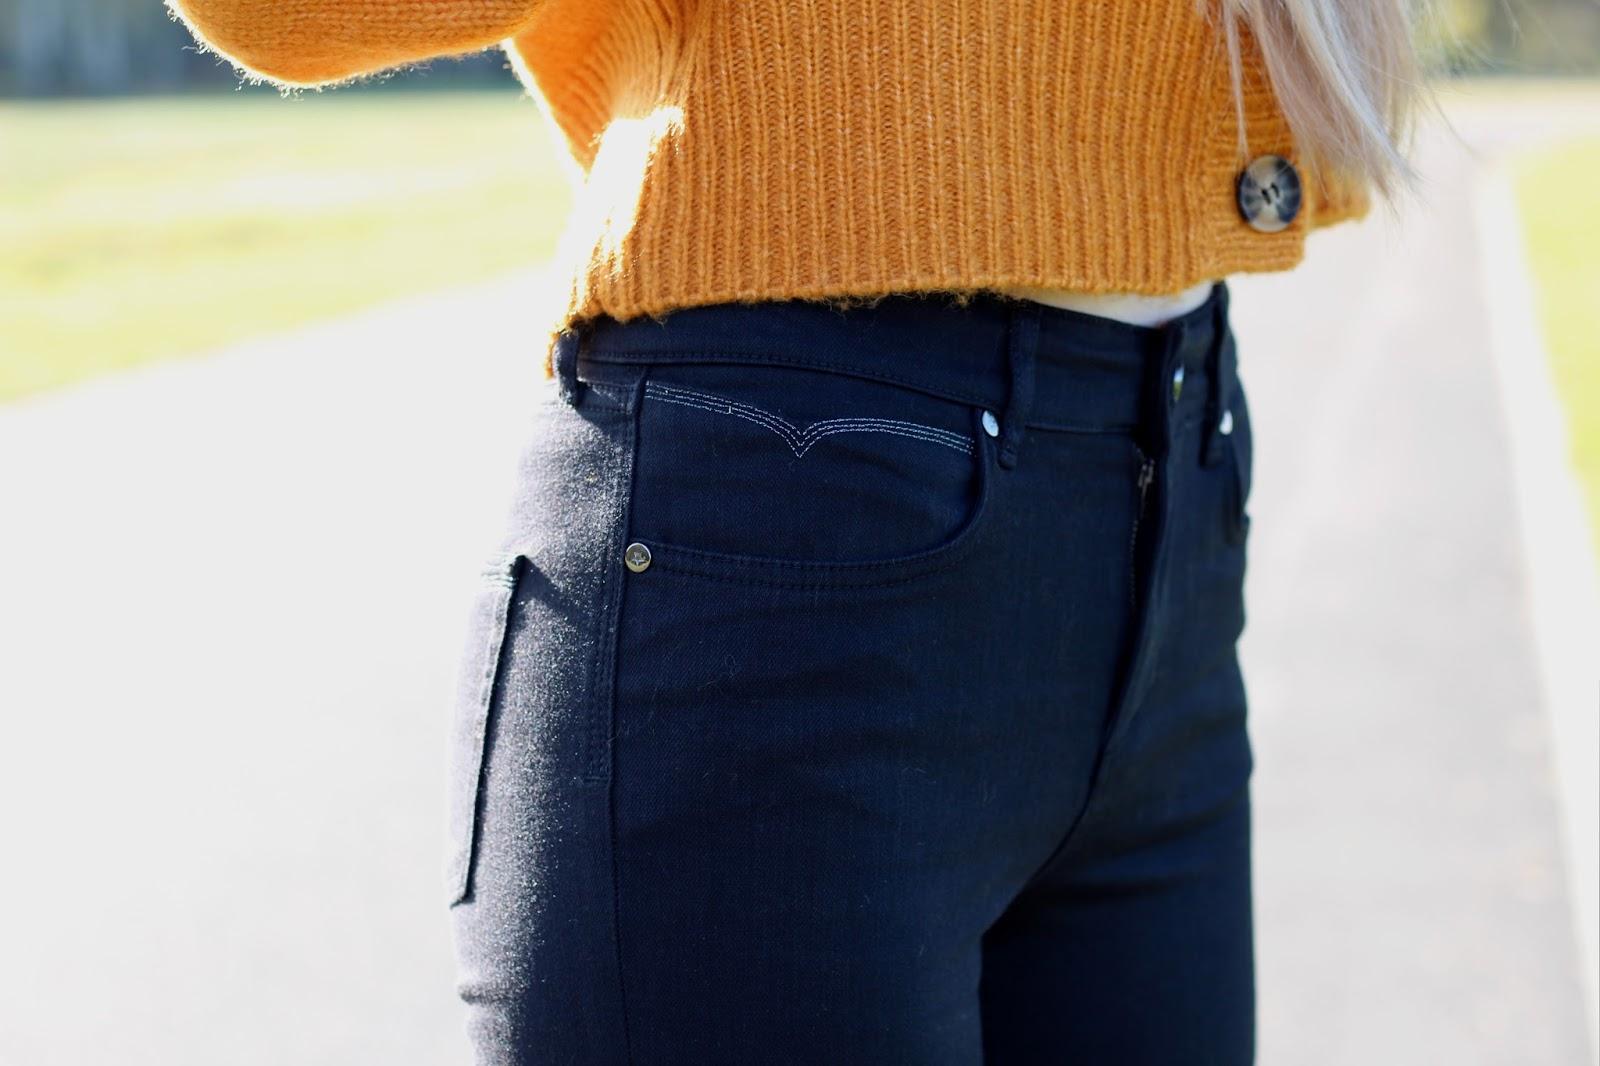 Black Liv Jeans by Donna Ida for Jaeger